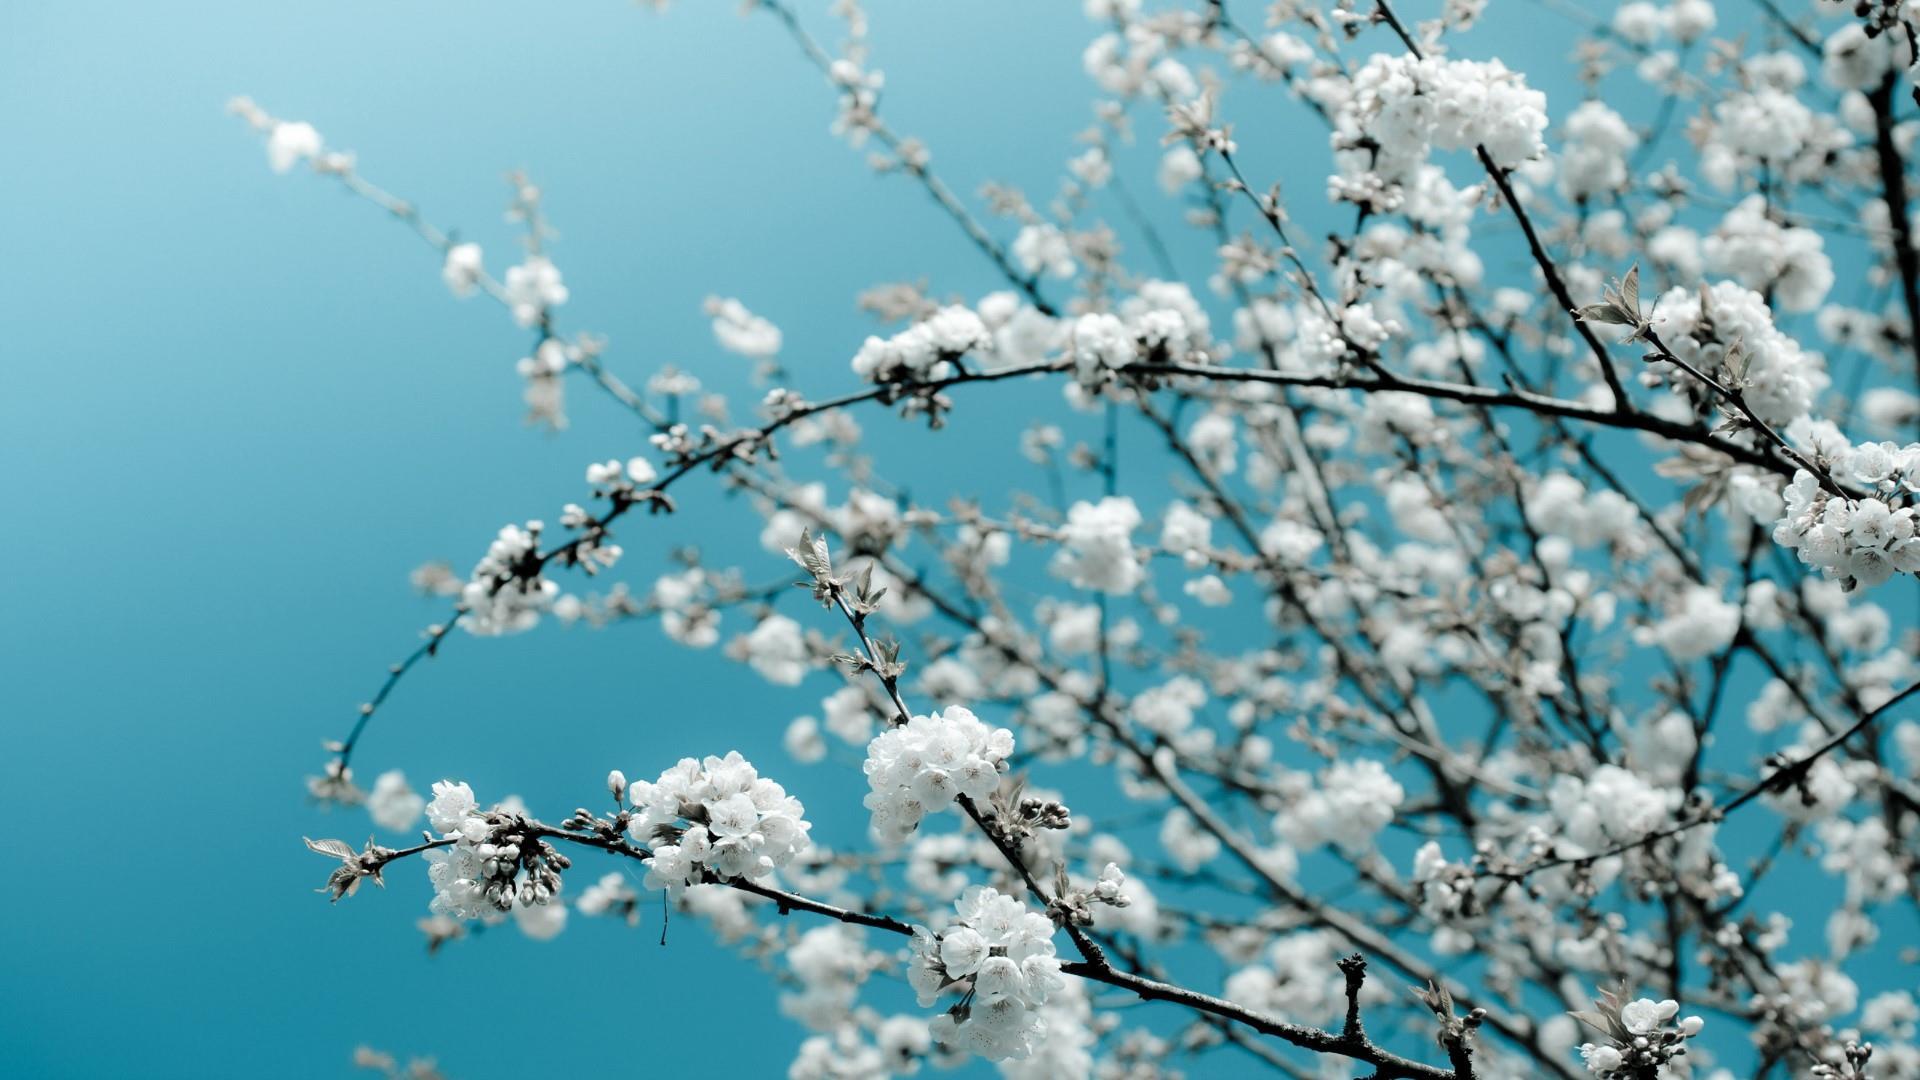 Сакура в цвету цветы весна